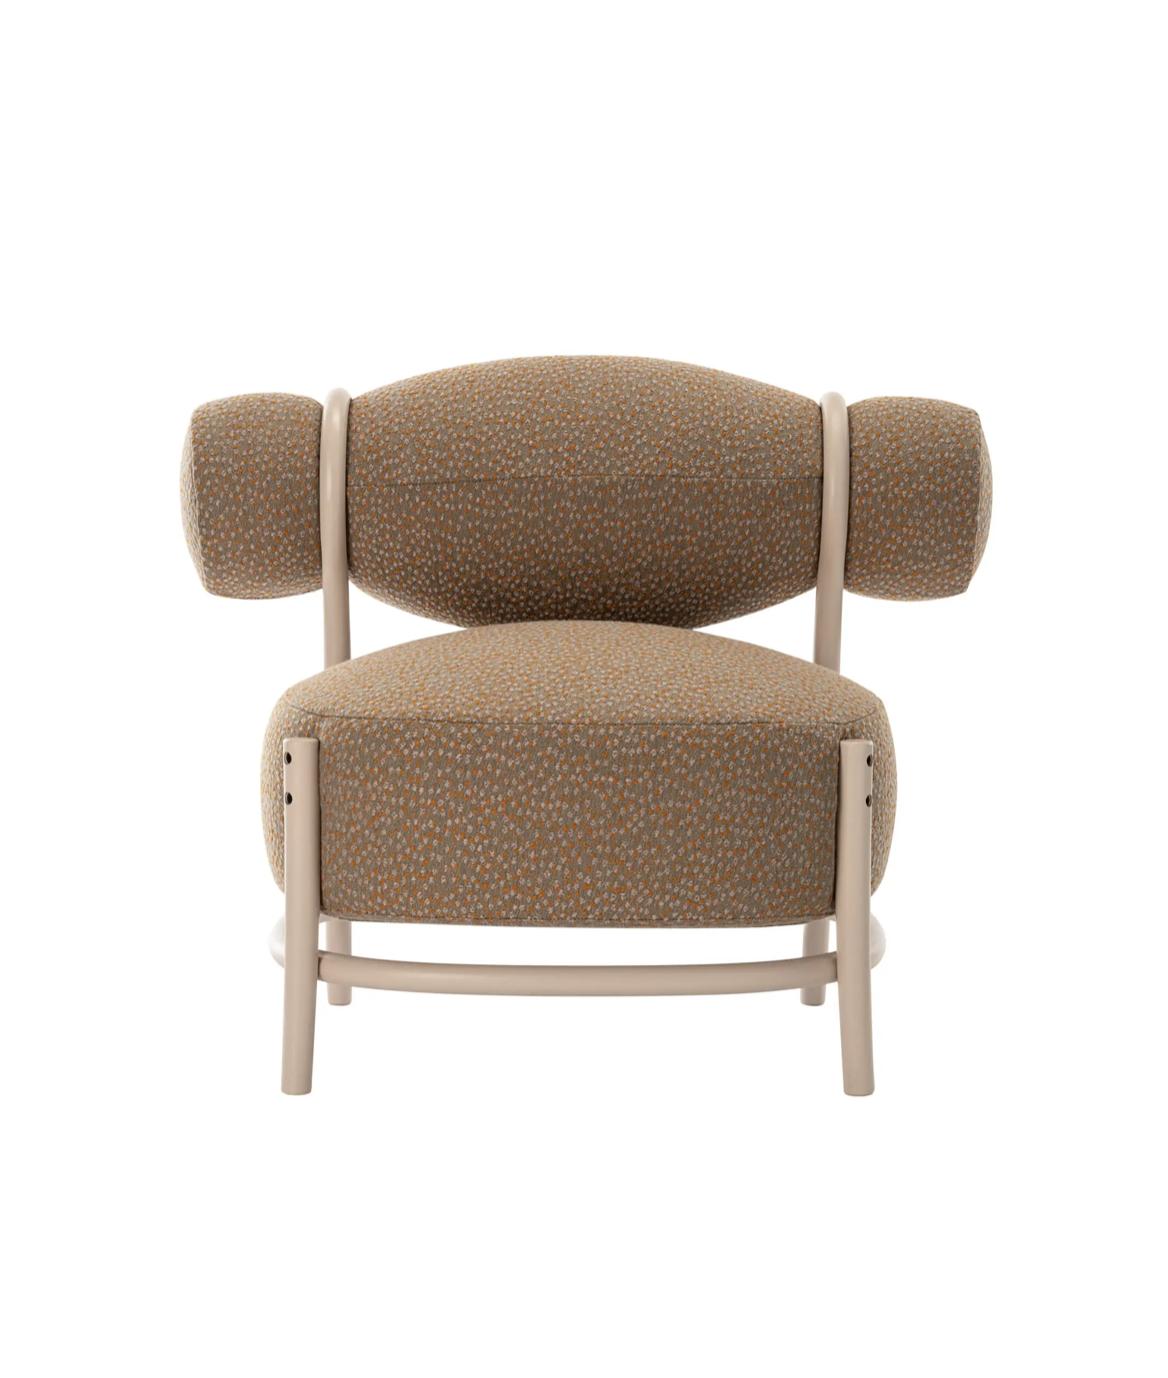 Chignon Lounge Chair